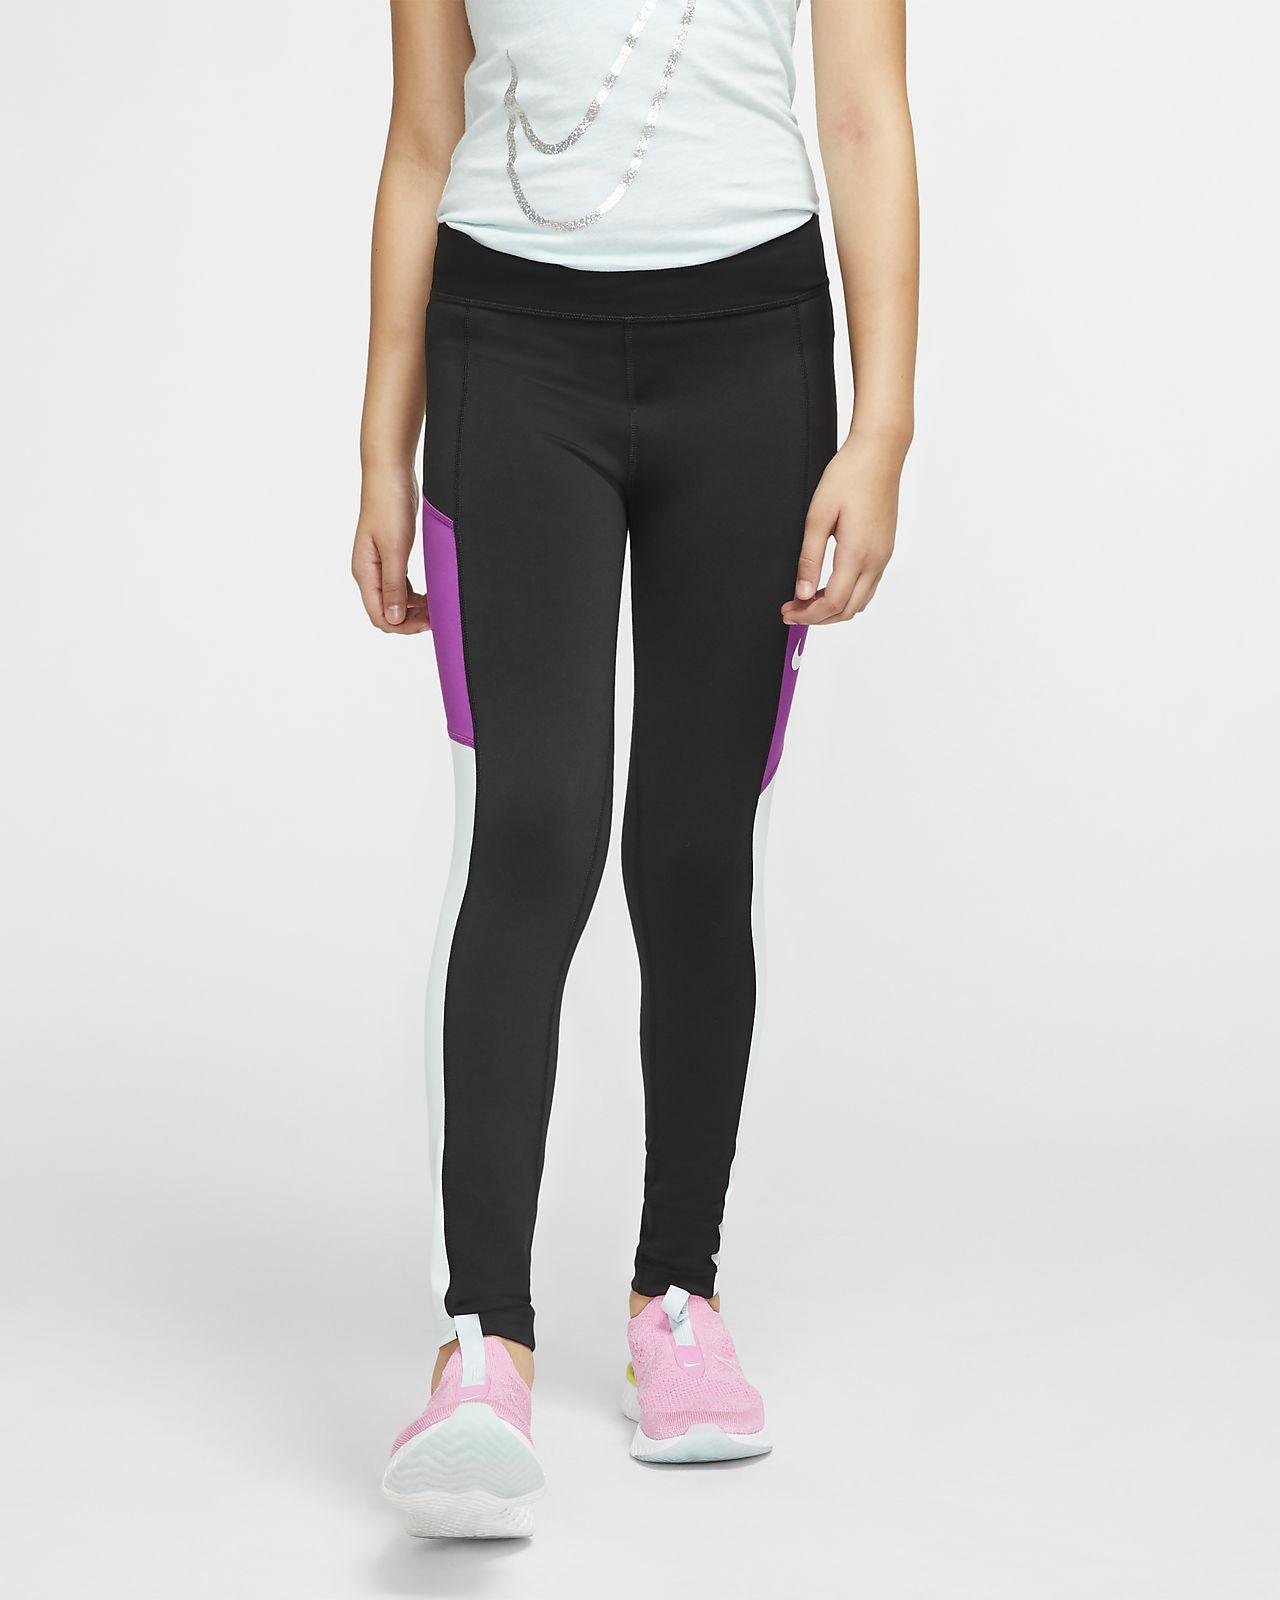 Nike Trophy Older Kids' (Girls') Training Tights